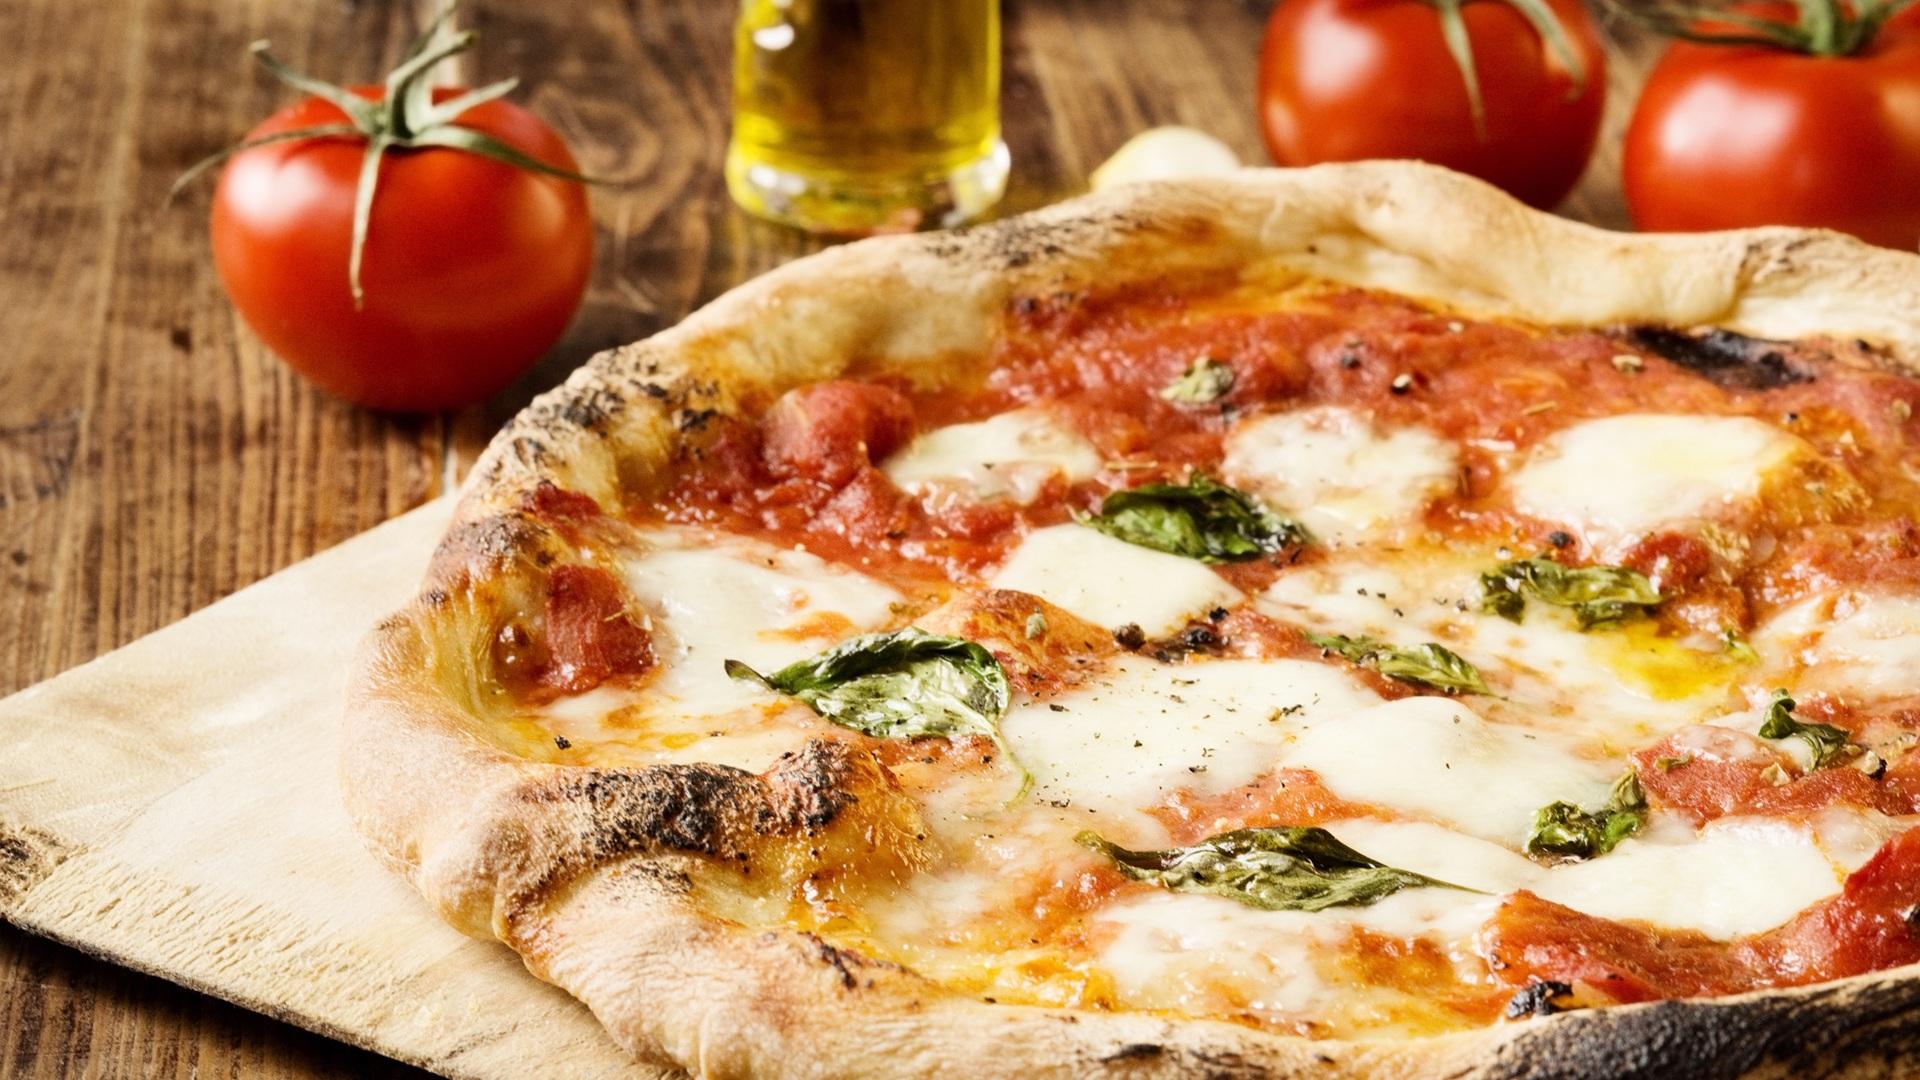 Pizza_Image_1920x1280px.jpg